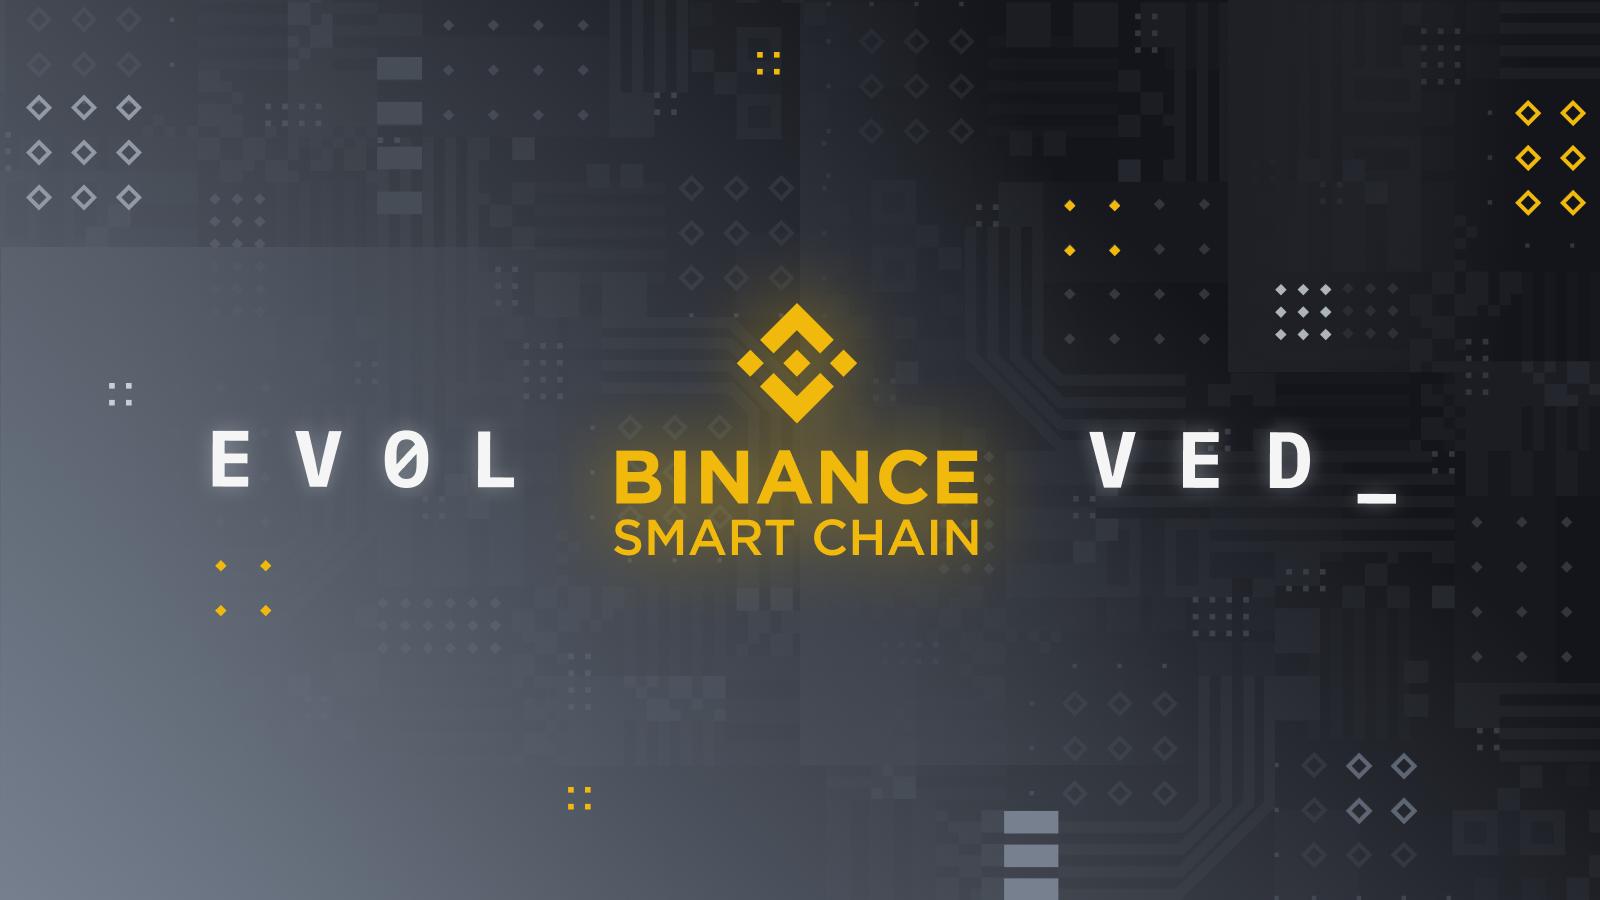 Binance Extension Wallet